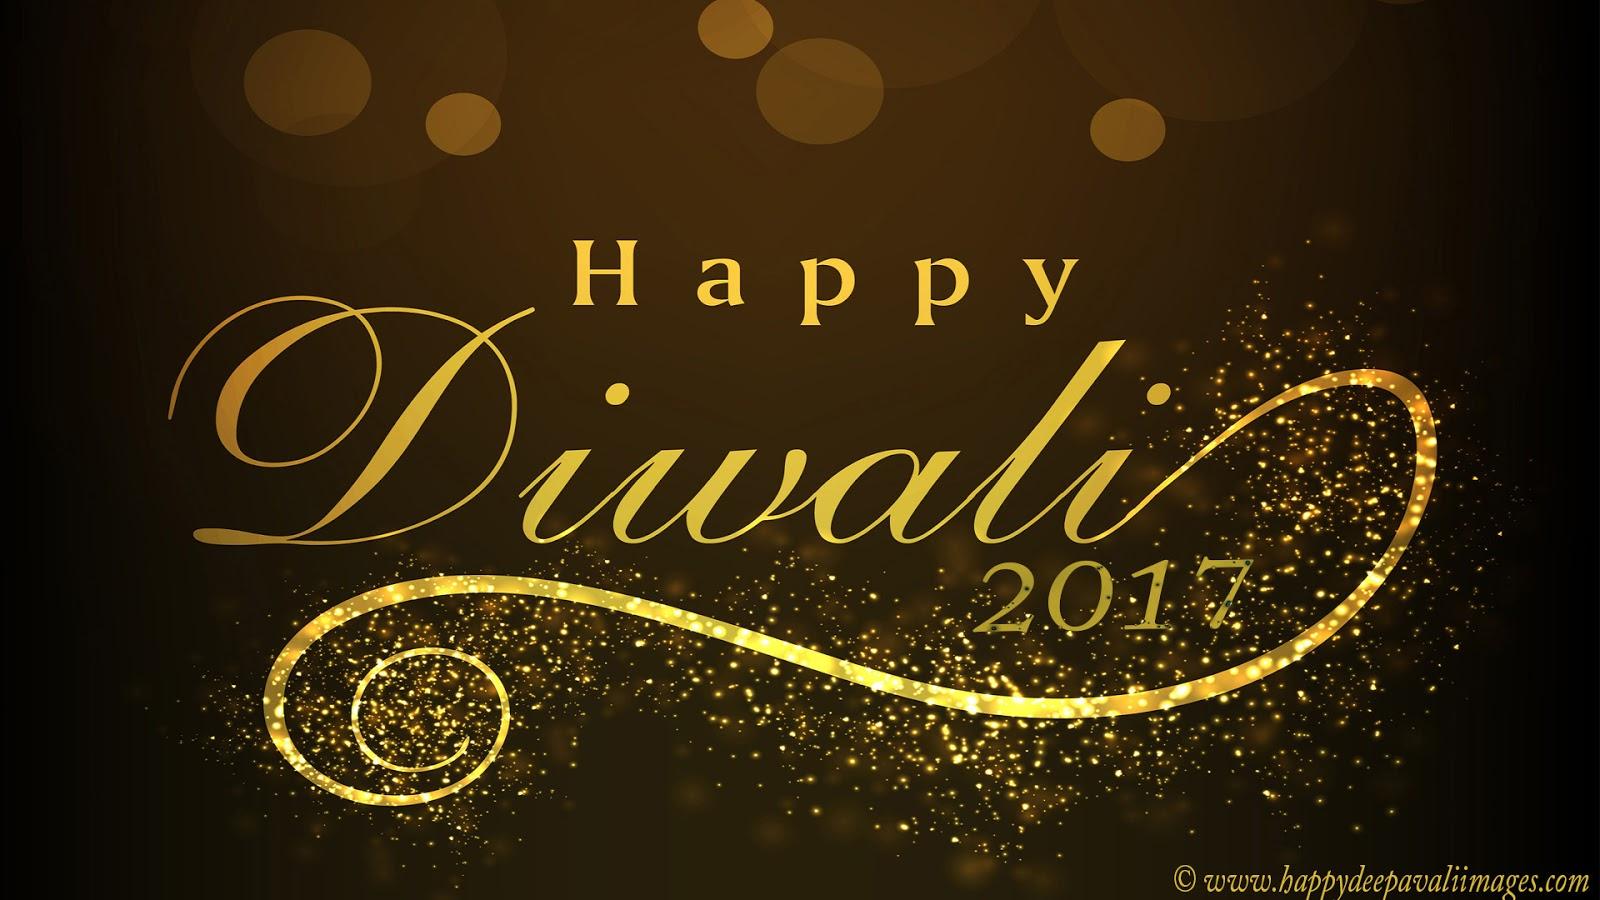 Happy Diwali Images 2018 Download Free HD